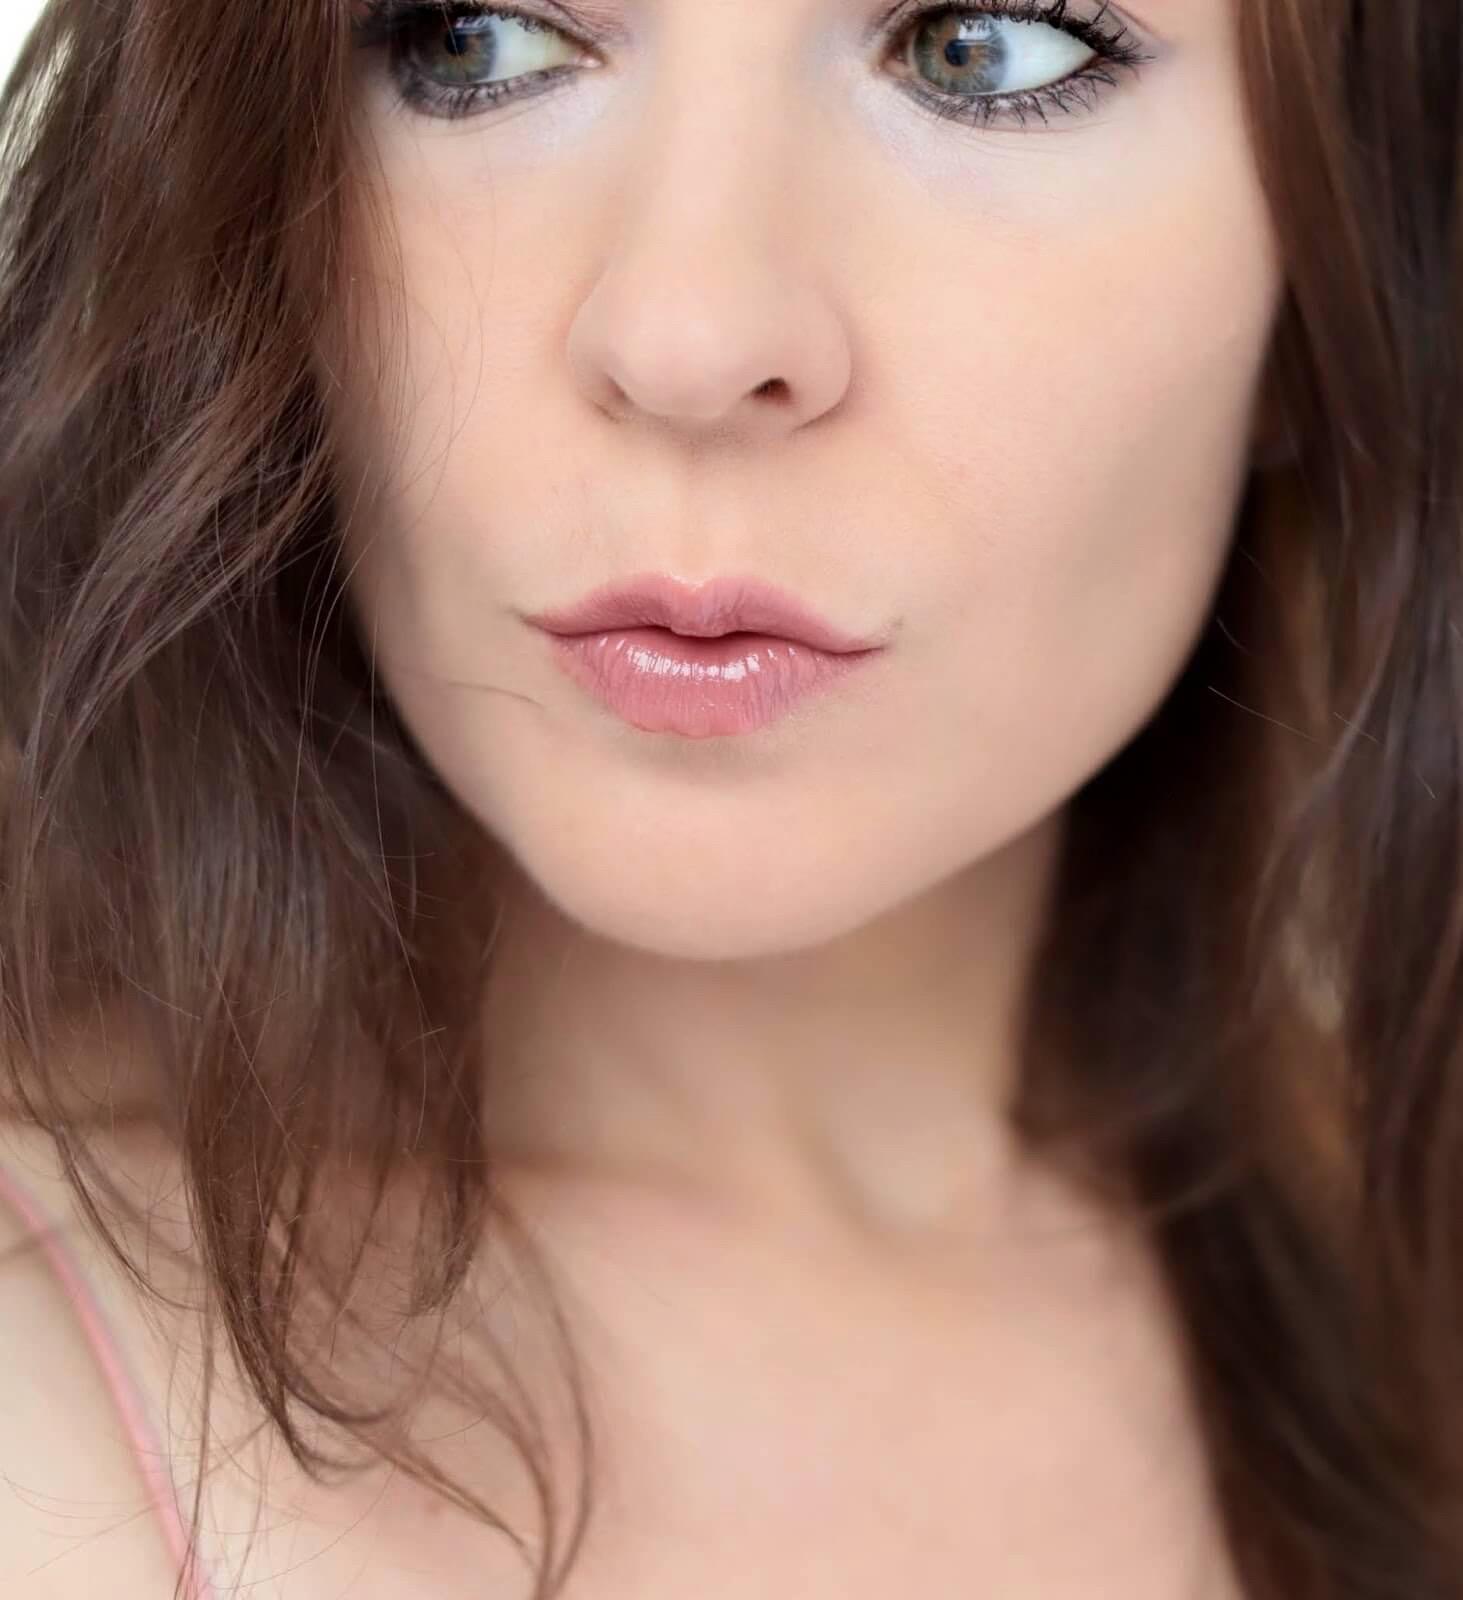 Charlotte Tilbury Everlasting Kiss swatch